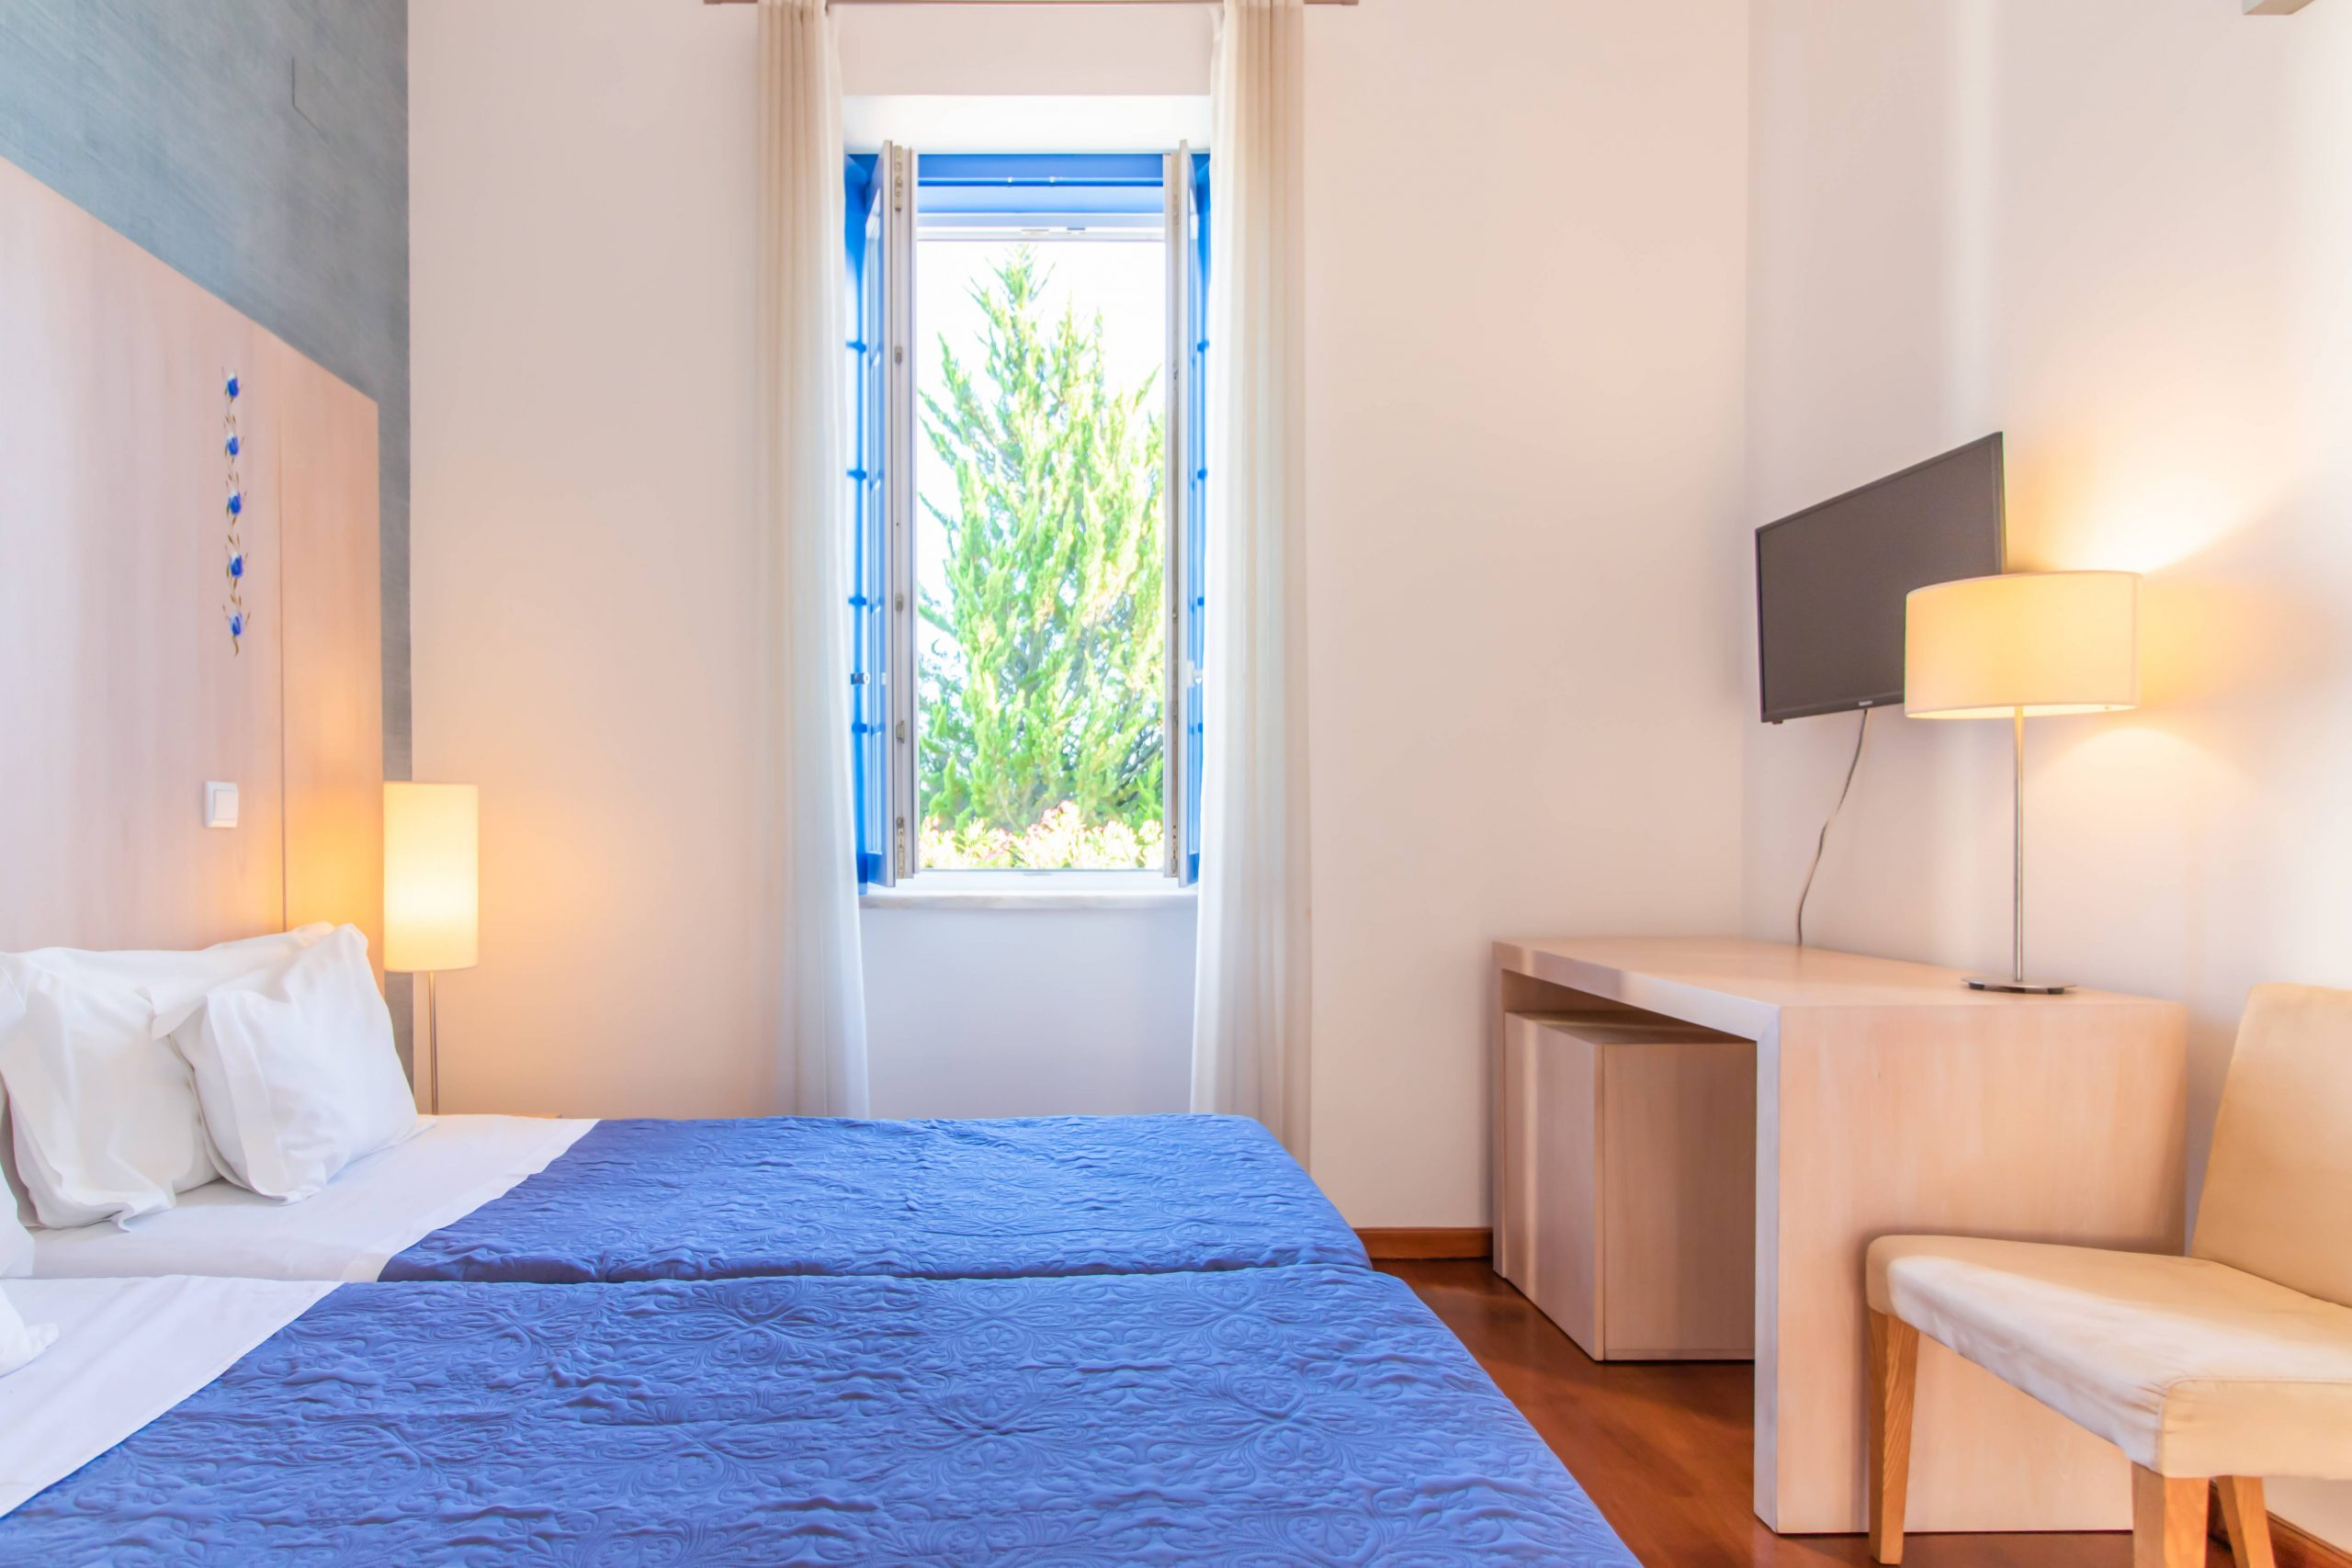 Hotel Lousal quarto twin